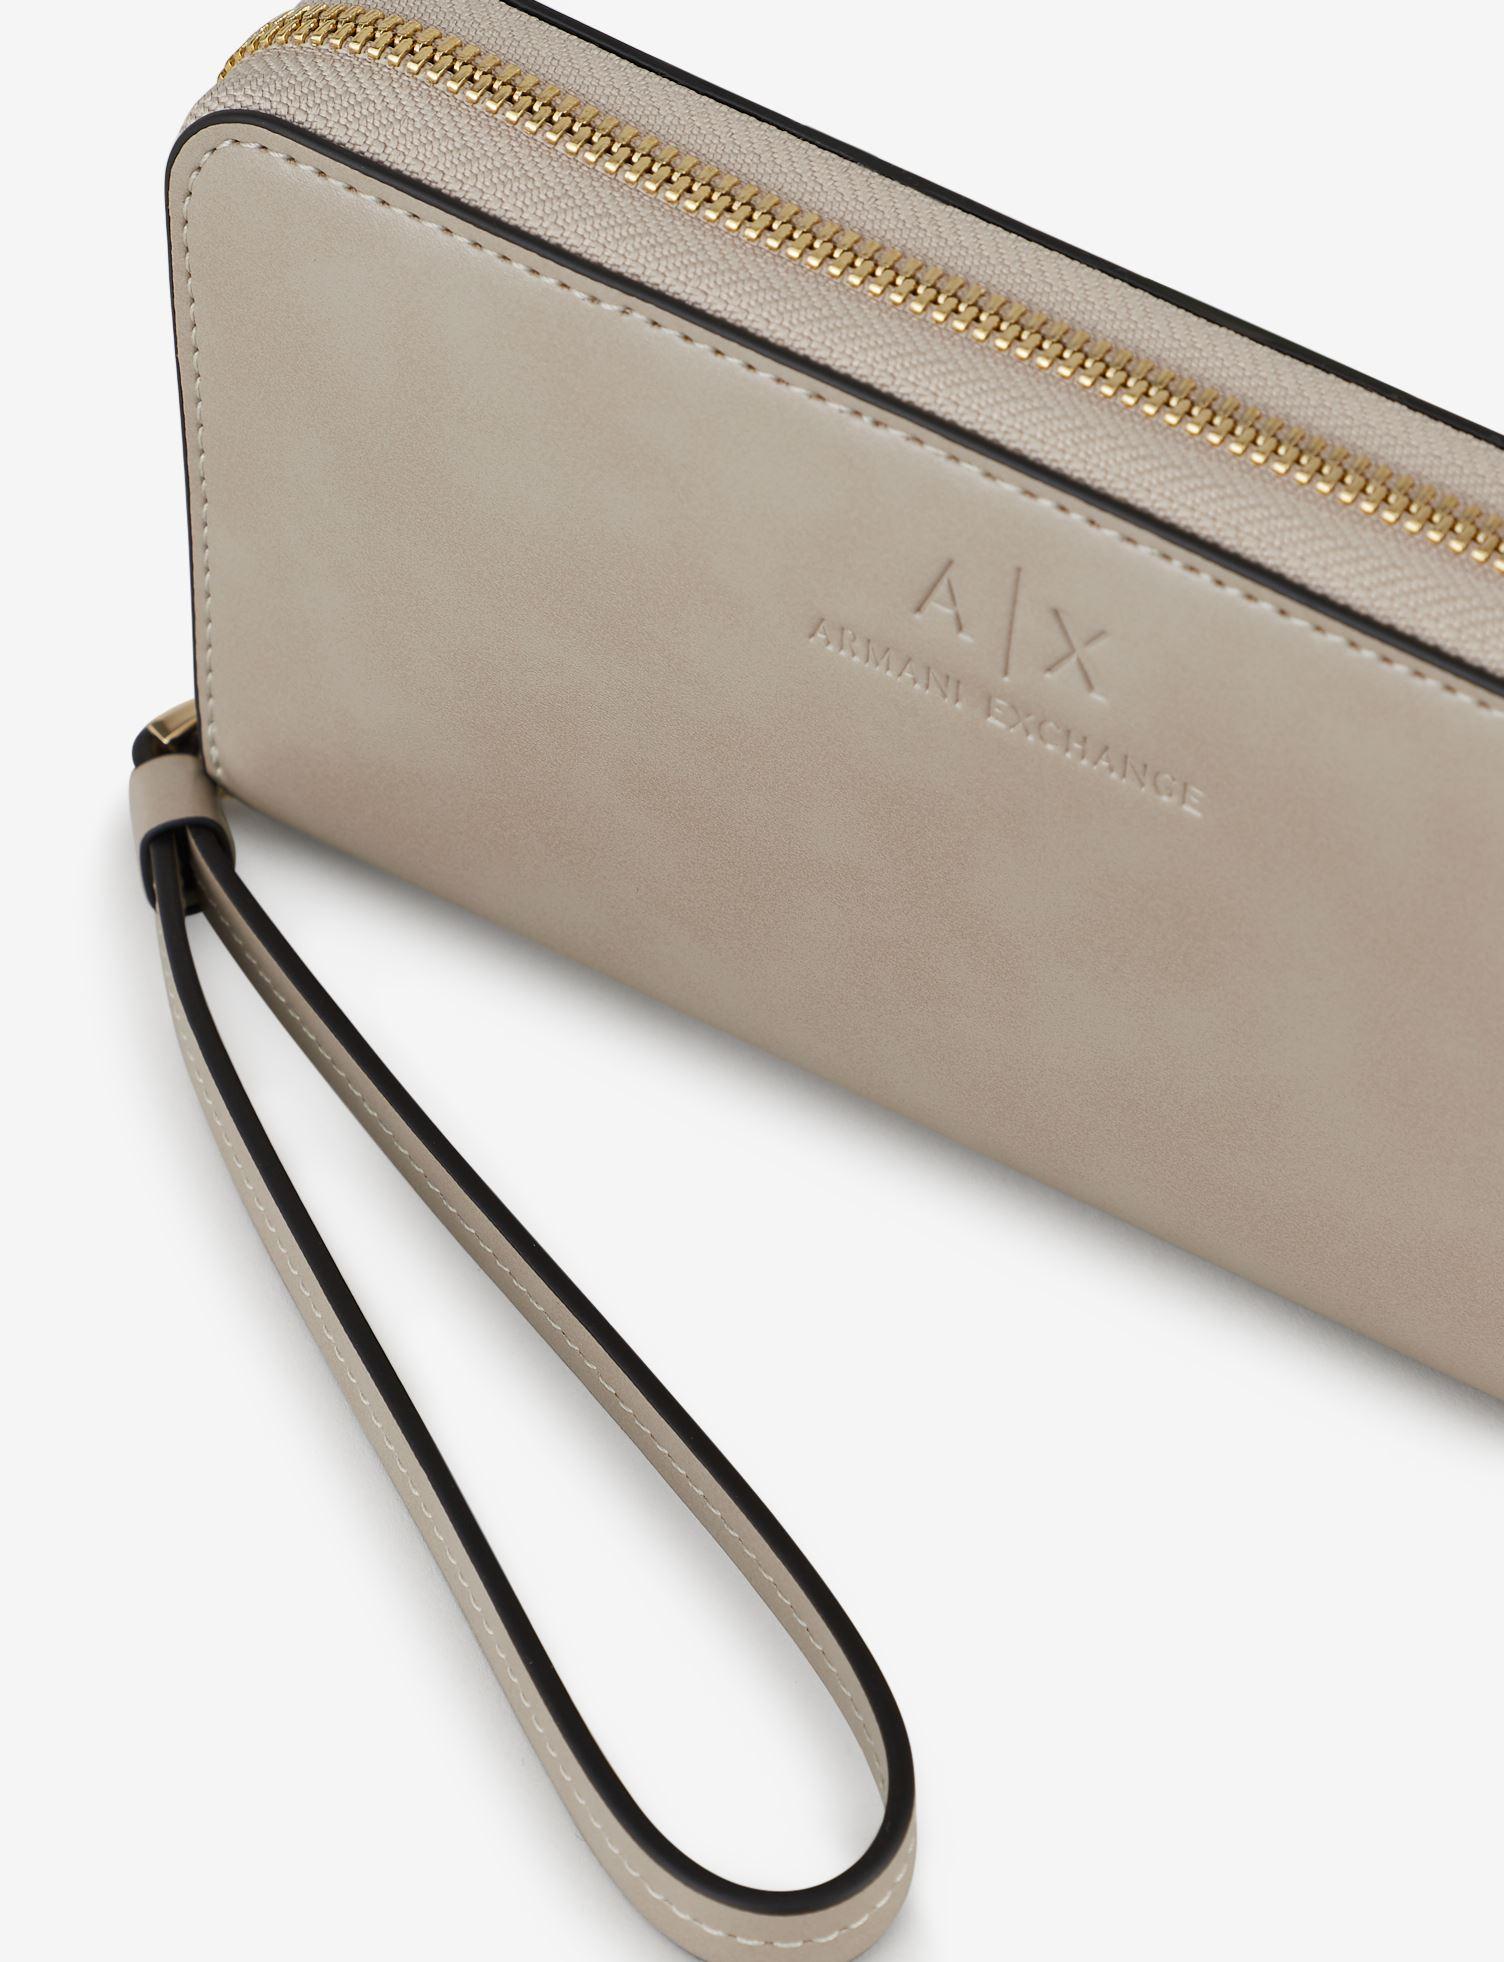 Portafoglio con zip Armani Exchange ARMANI EXCHANGE   Portacarte   948068-CC79544620